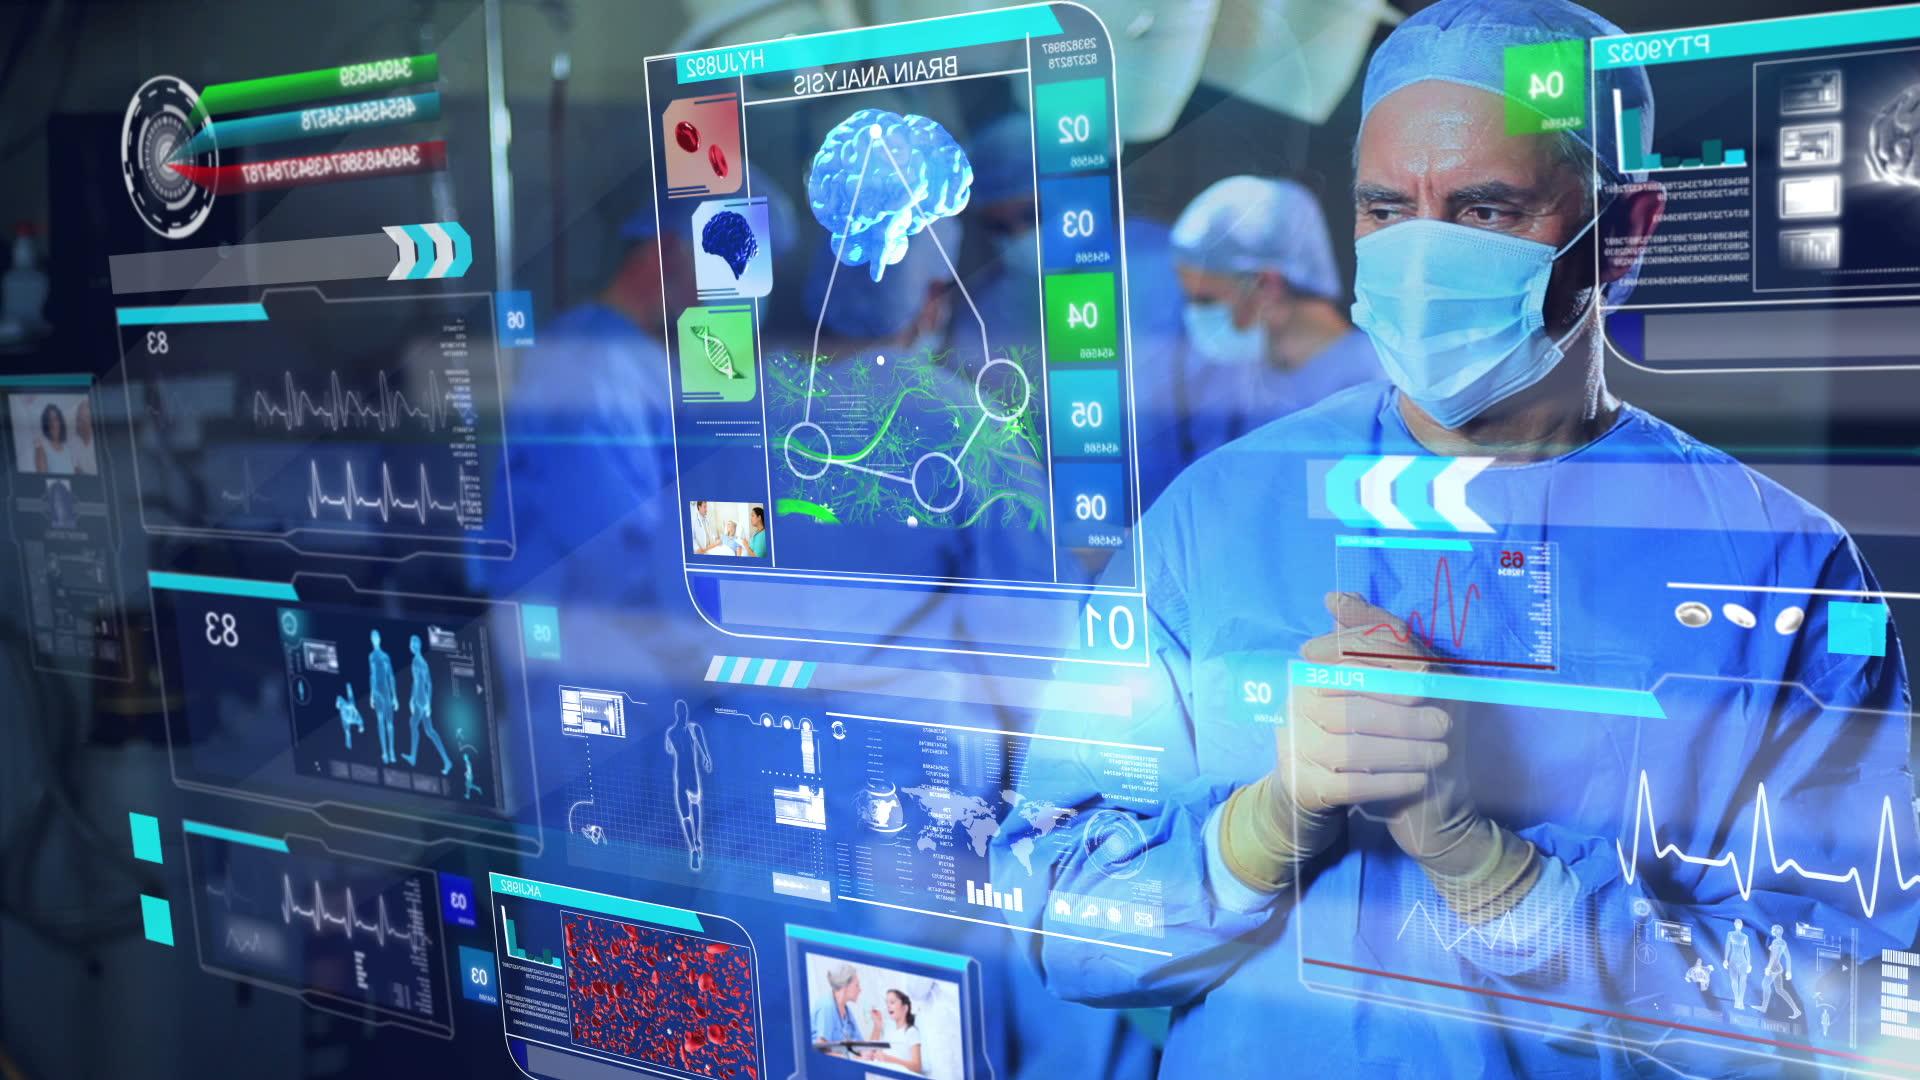 RFID在智慧医疗领域中发挥哪些重要作用